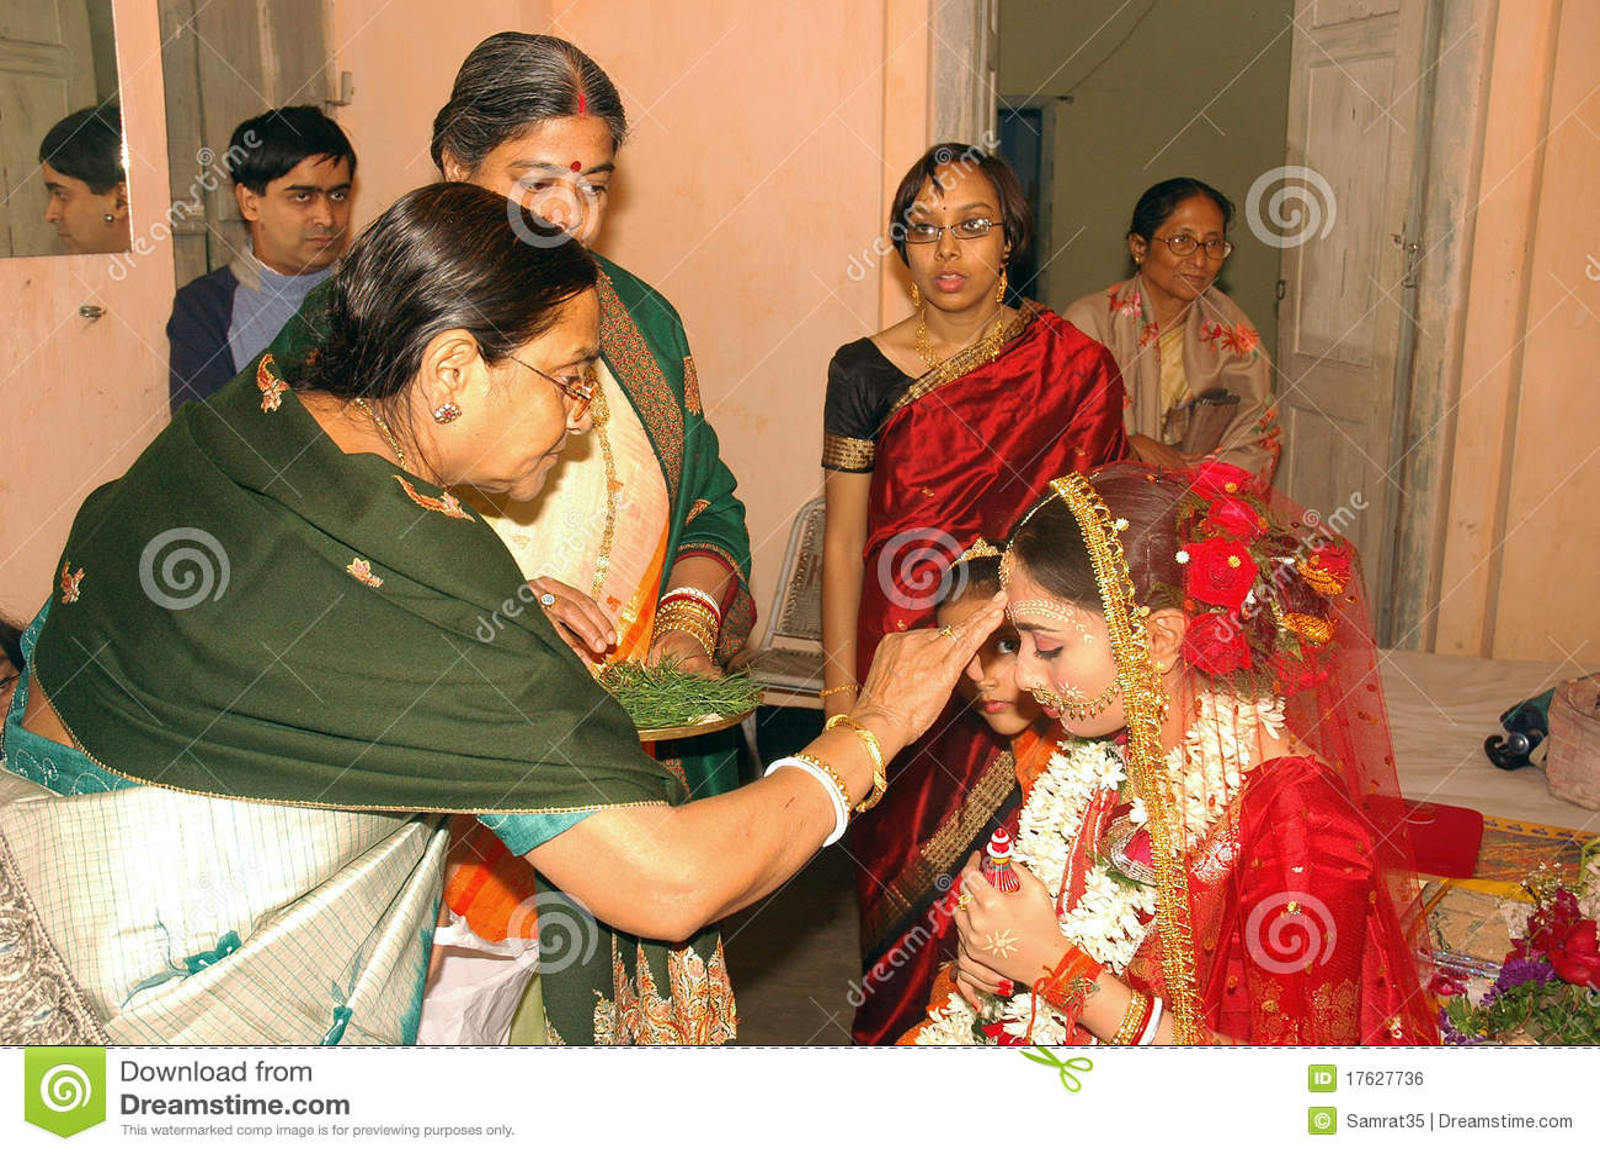 Wedding Gift Ideas Kolkata : December 27,2010 Kolkata, West Bengal, India - The grooms family ...